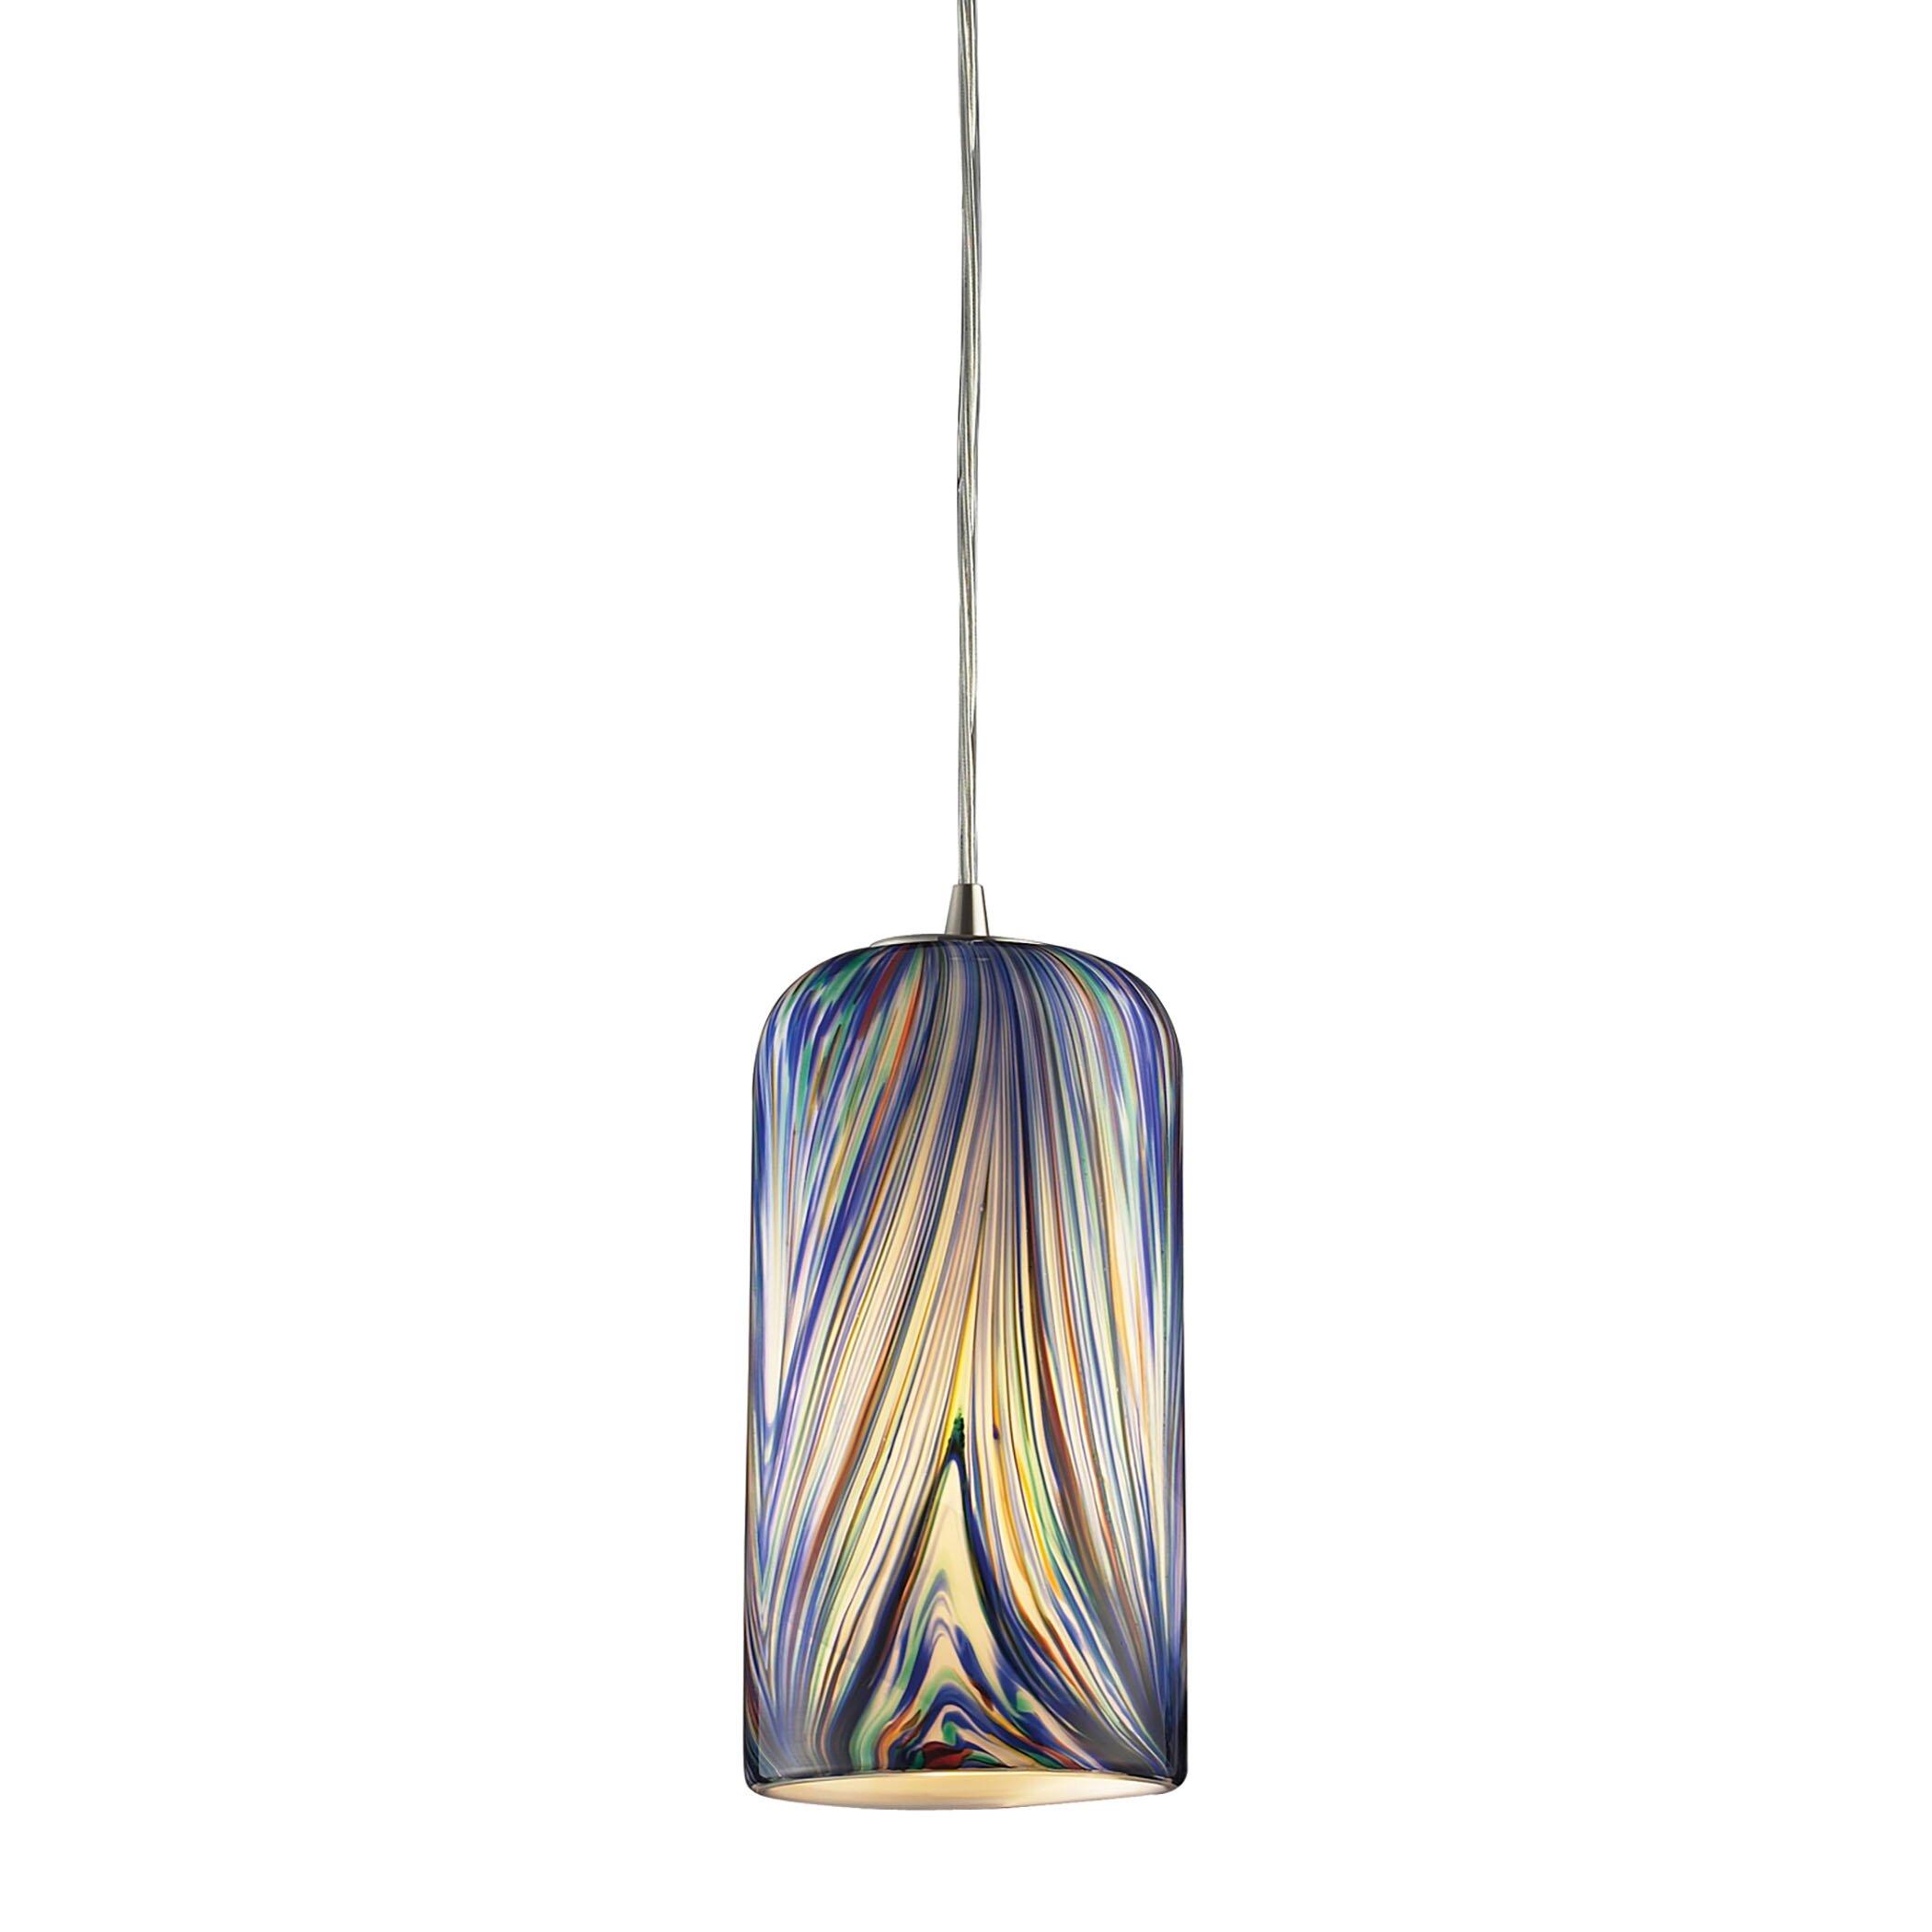 Elk Lighting Amazon: Elk Lighting Molten 1 Light Mini Pendant & Reviews